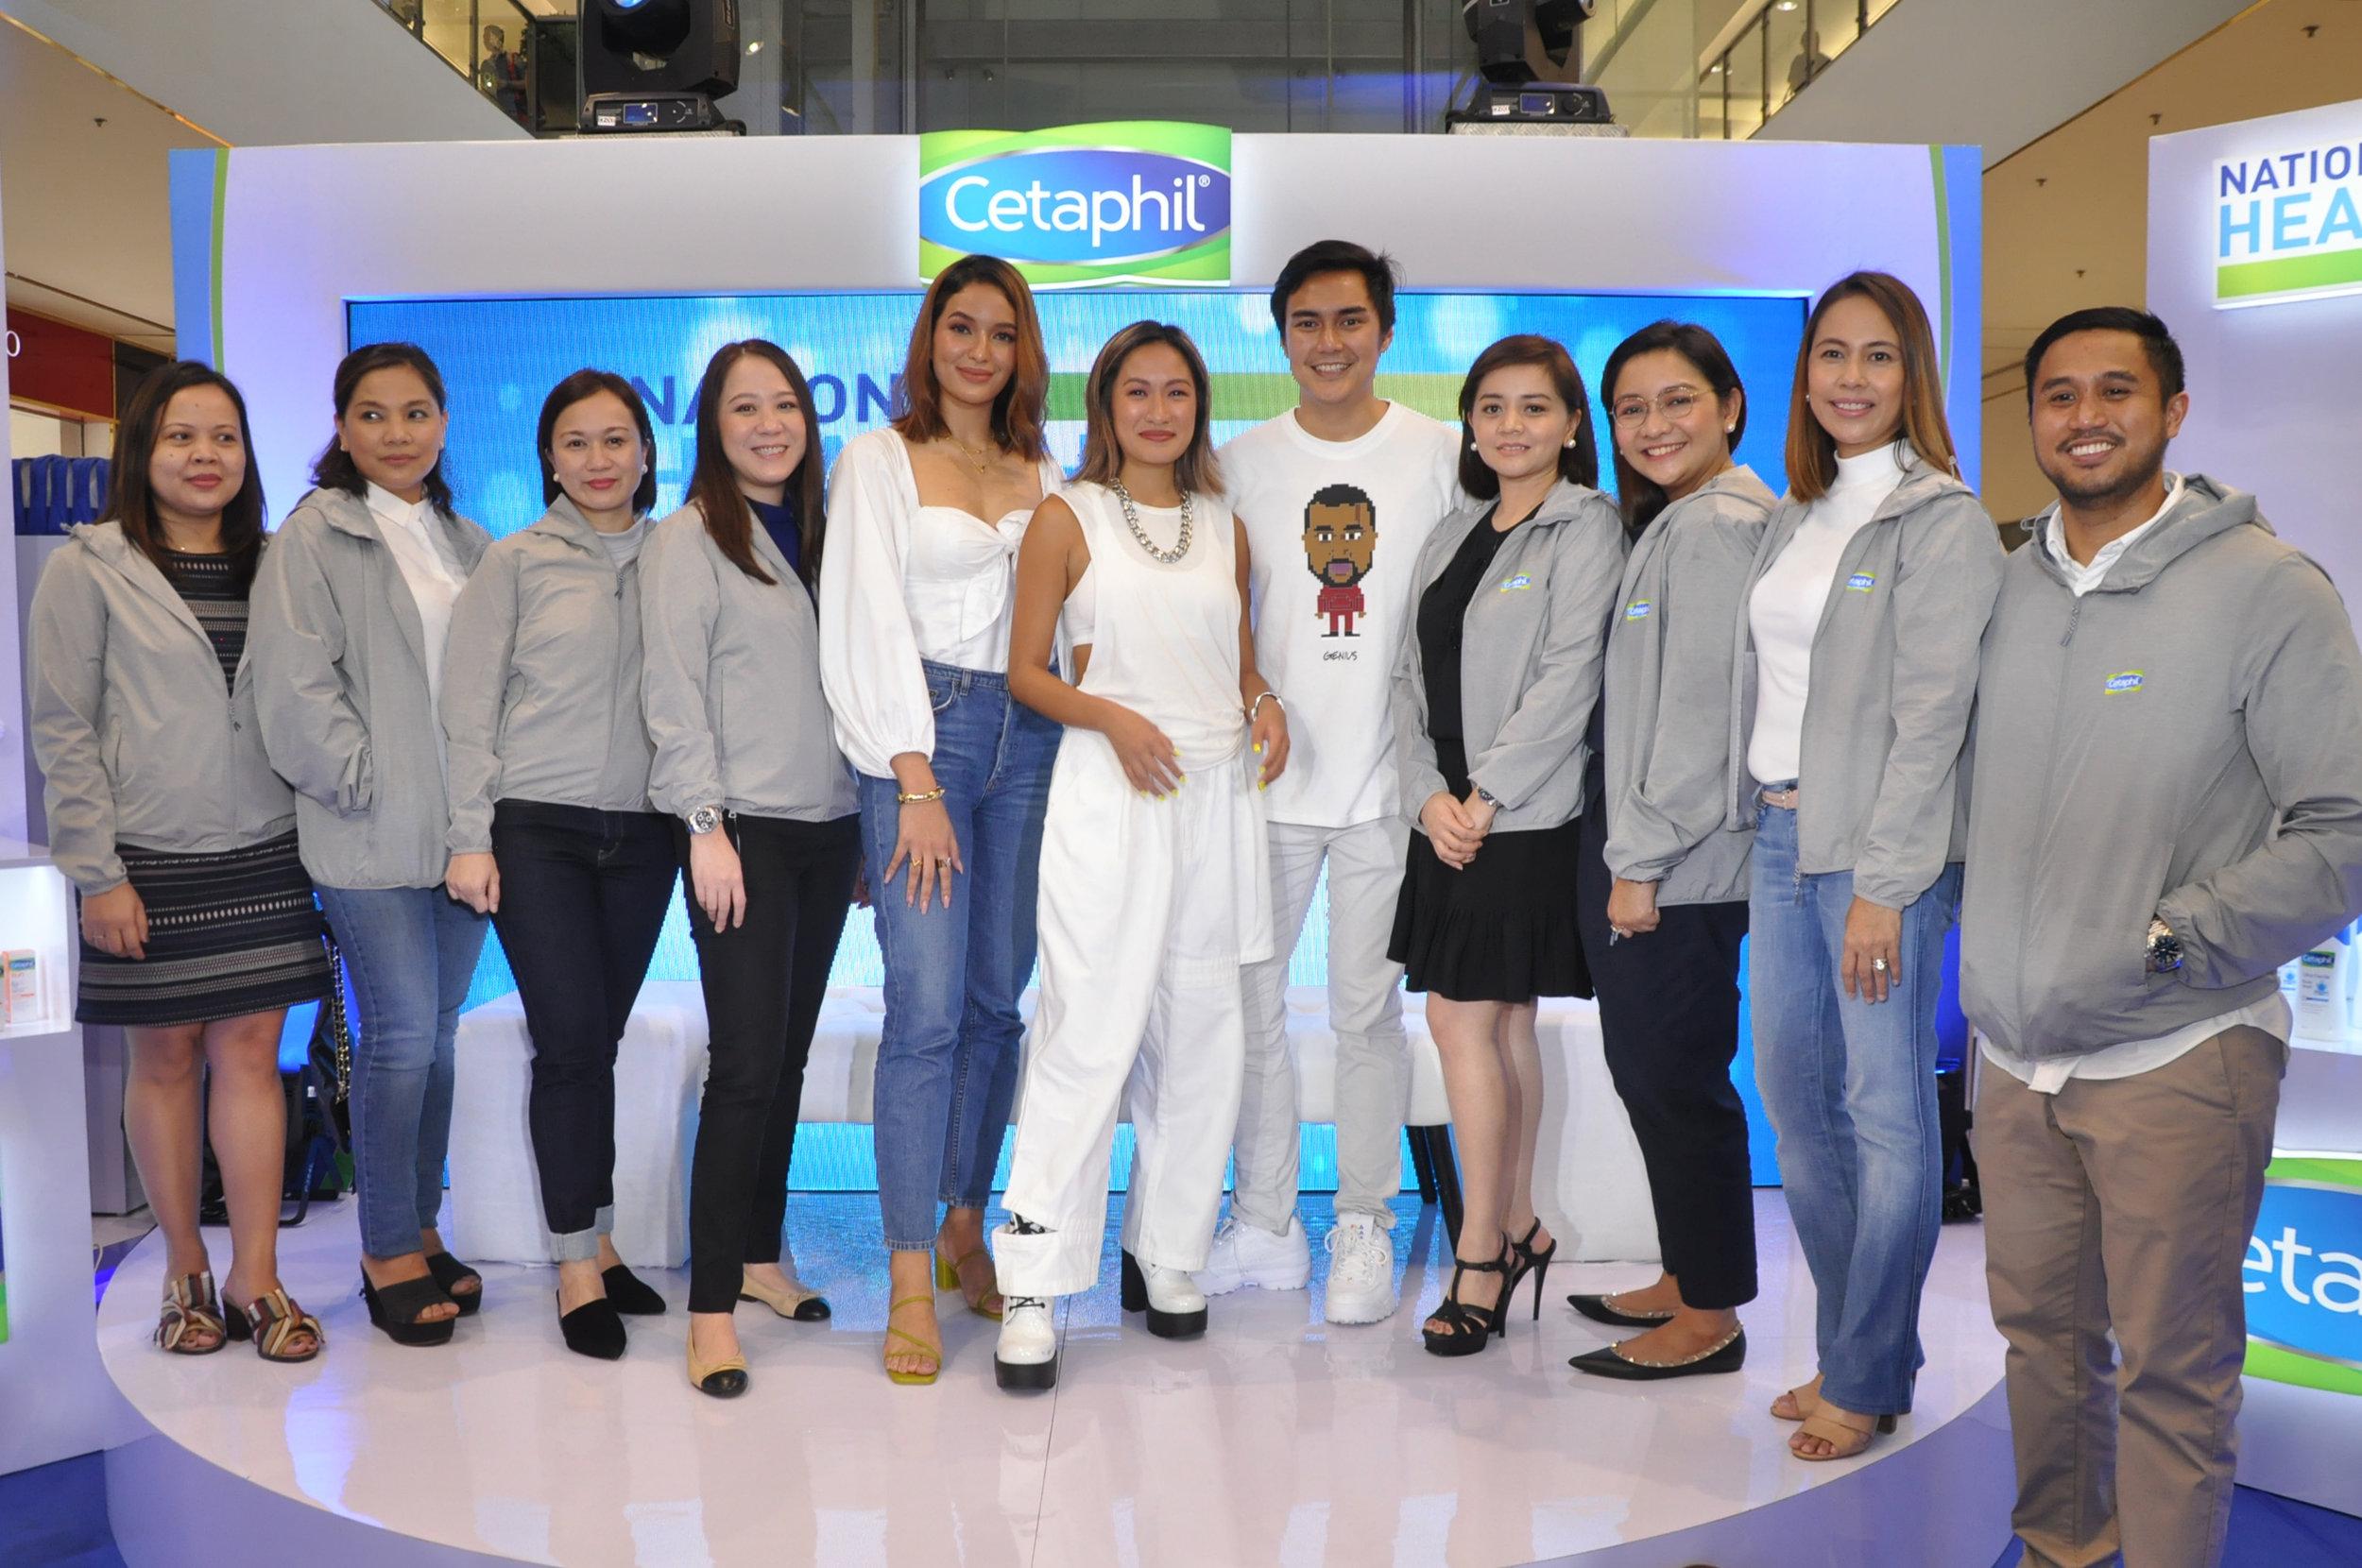 The Cetaphil team with Sarah Lahbati, Laureen Uy, and Miggy Cruz